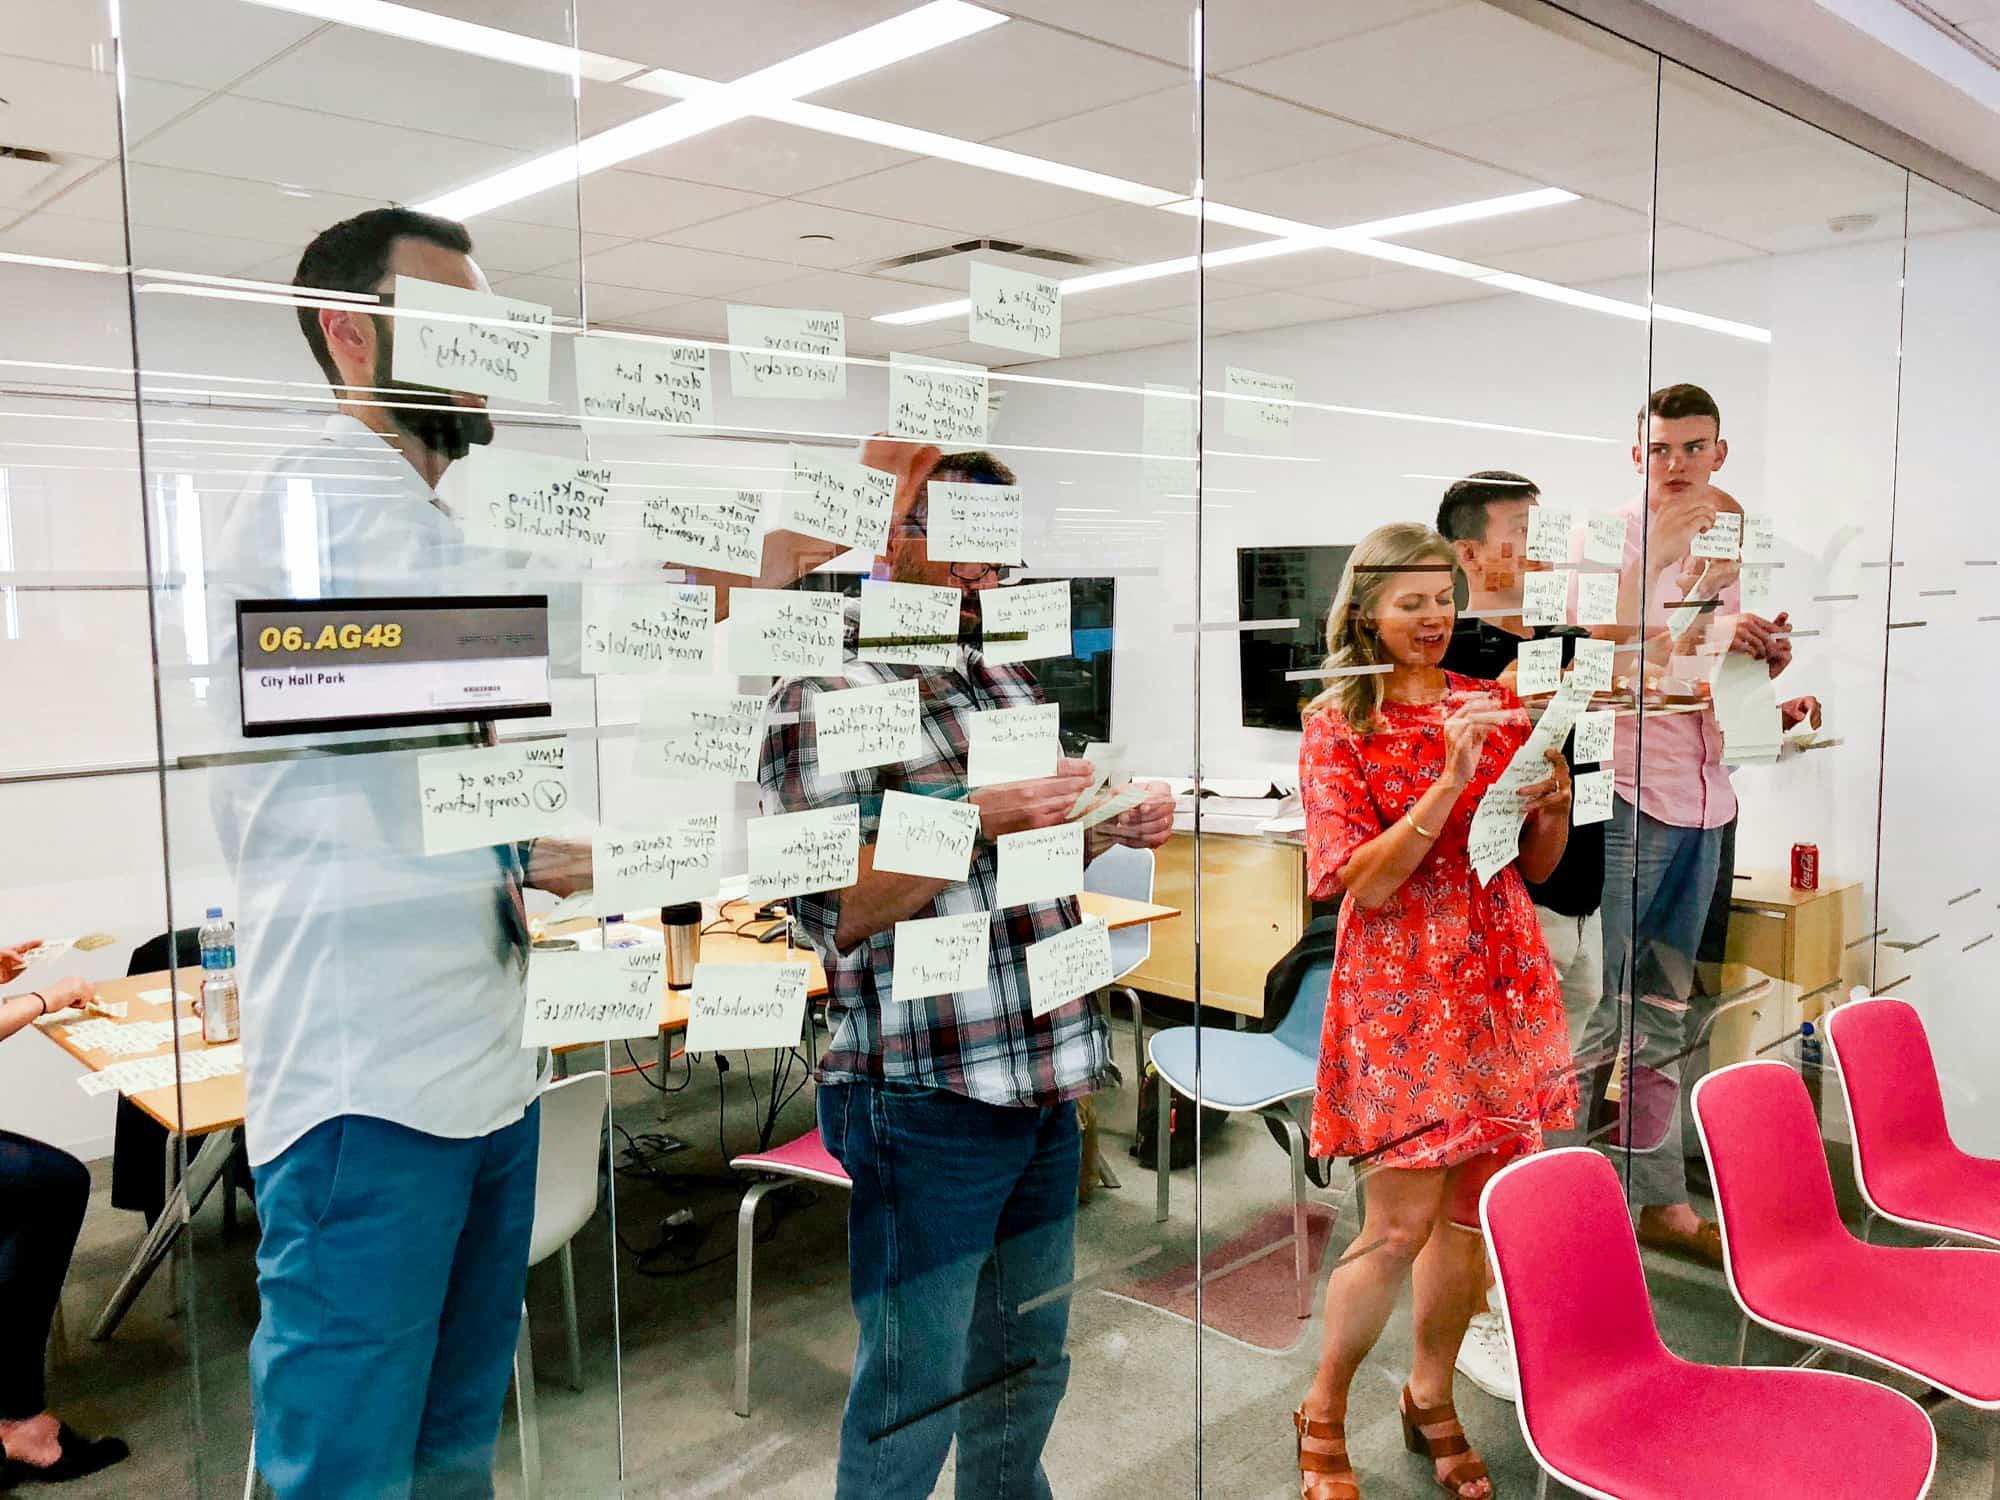 The WSJ Design team at a recent design sprint